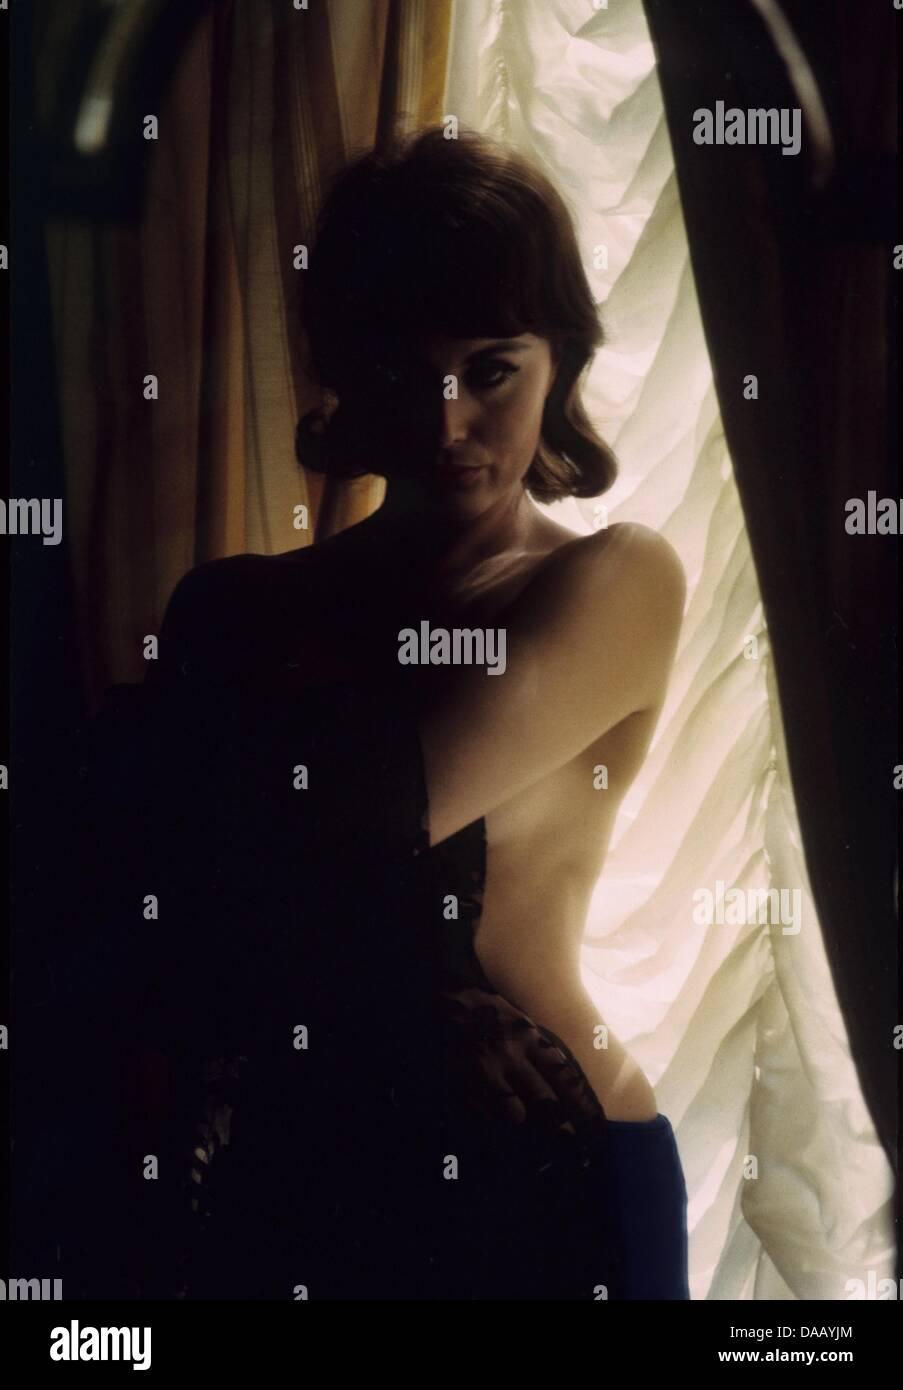 Ali Landry,Neva Carr Glyn XXX movies P. J. Sparxx,Matt Austin